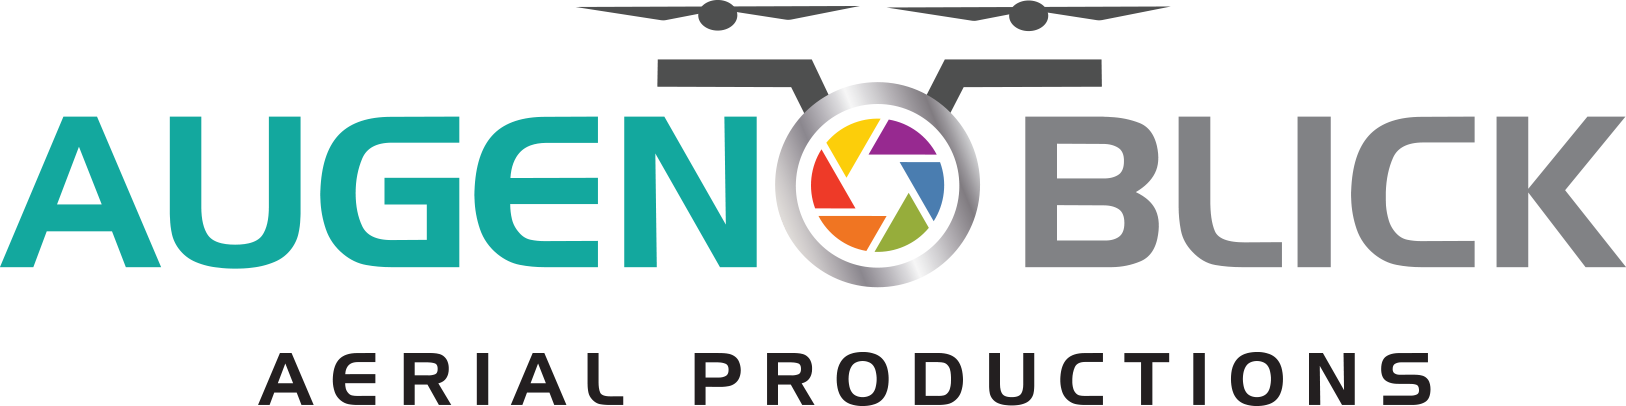 Augenblick Productions